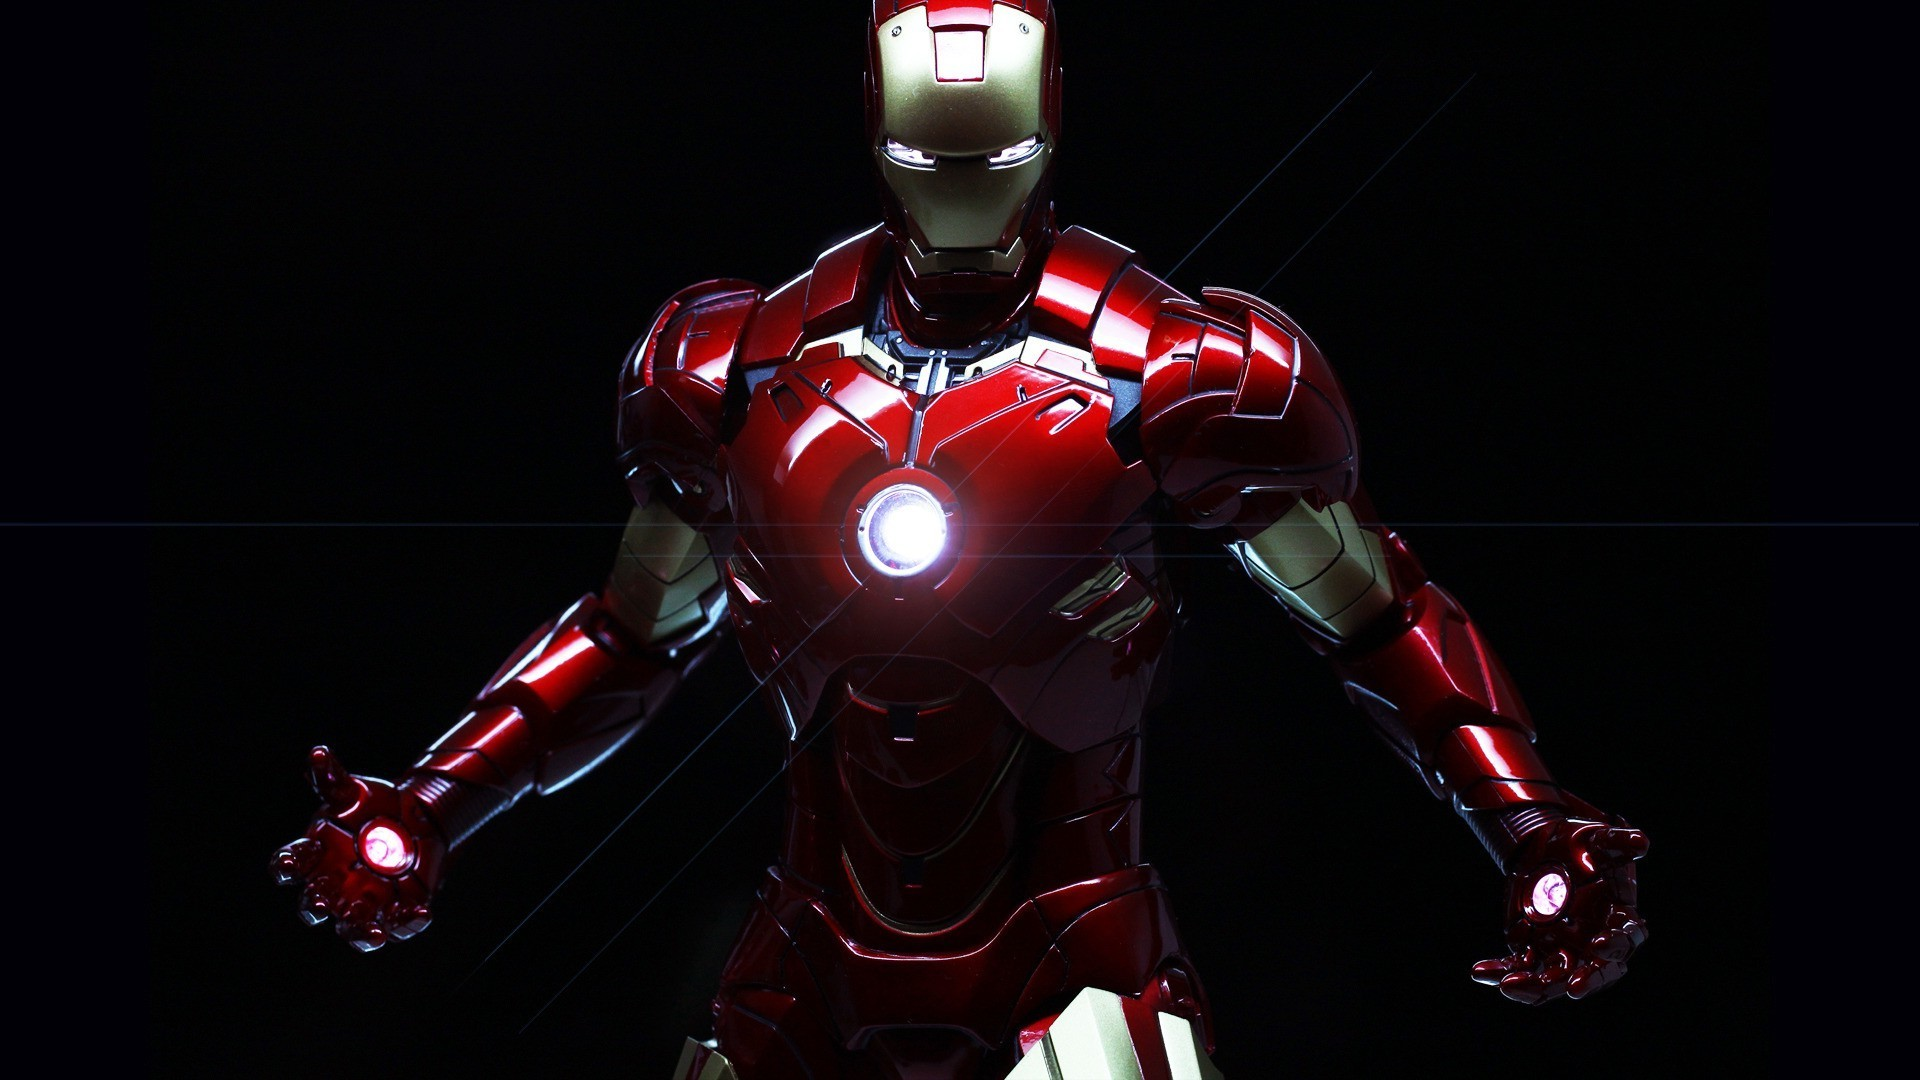 Best Hd Iron Man Wallpapers Wallpapersafari